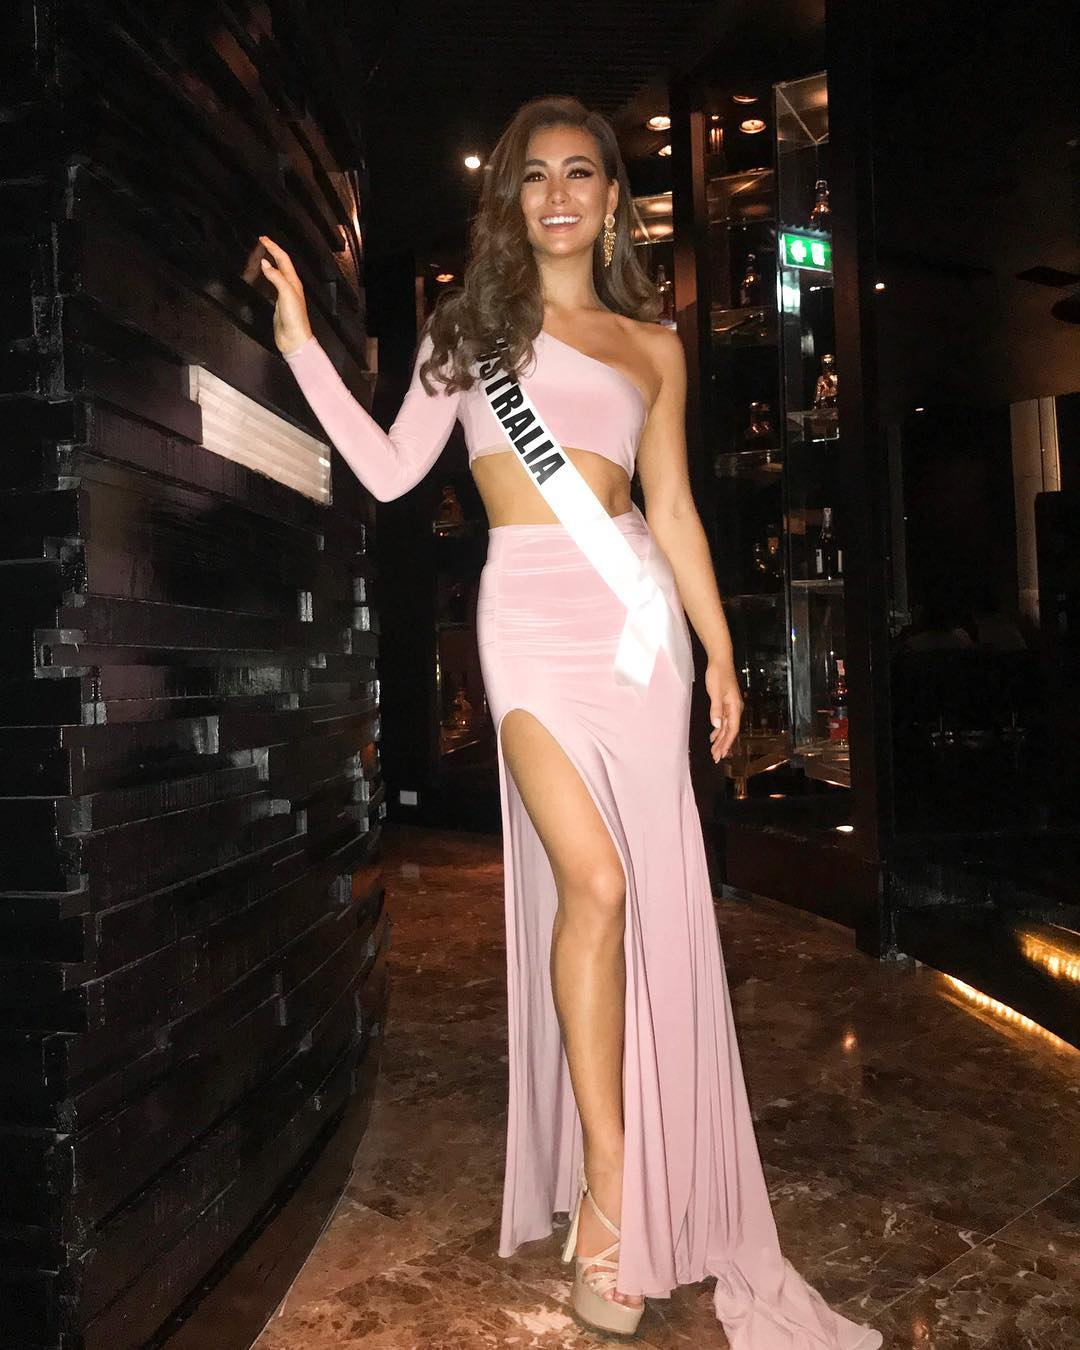 welcome dinner de candidatas a miss universe 2018. - Página 11 8e6vmmyf